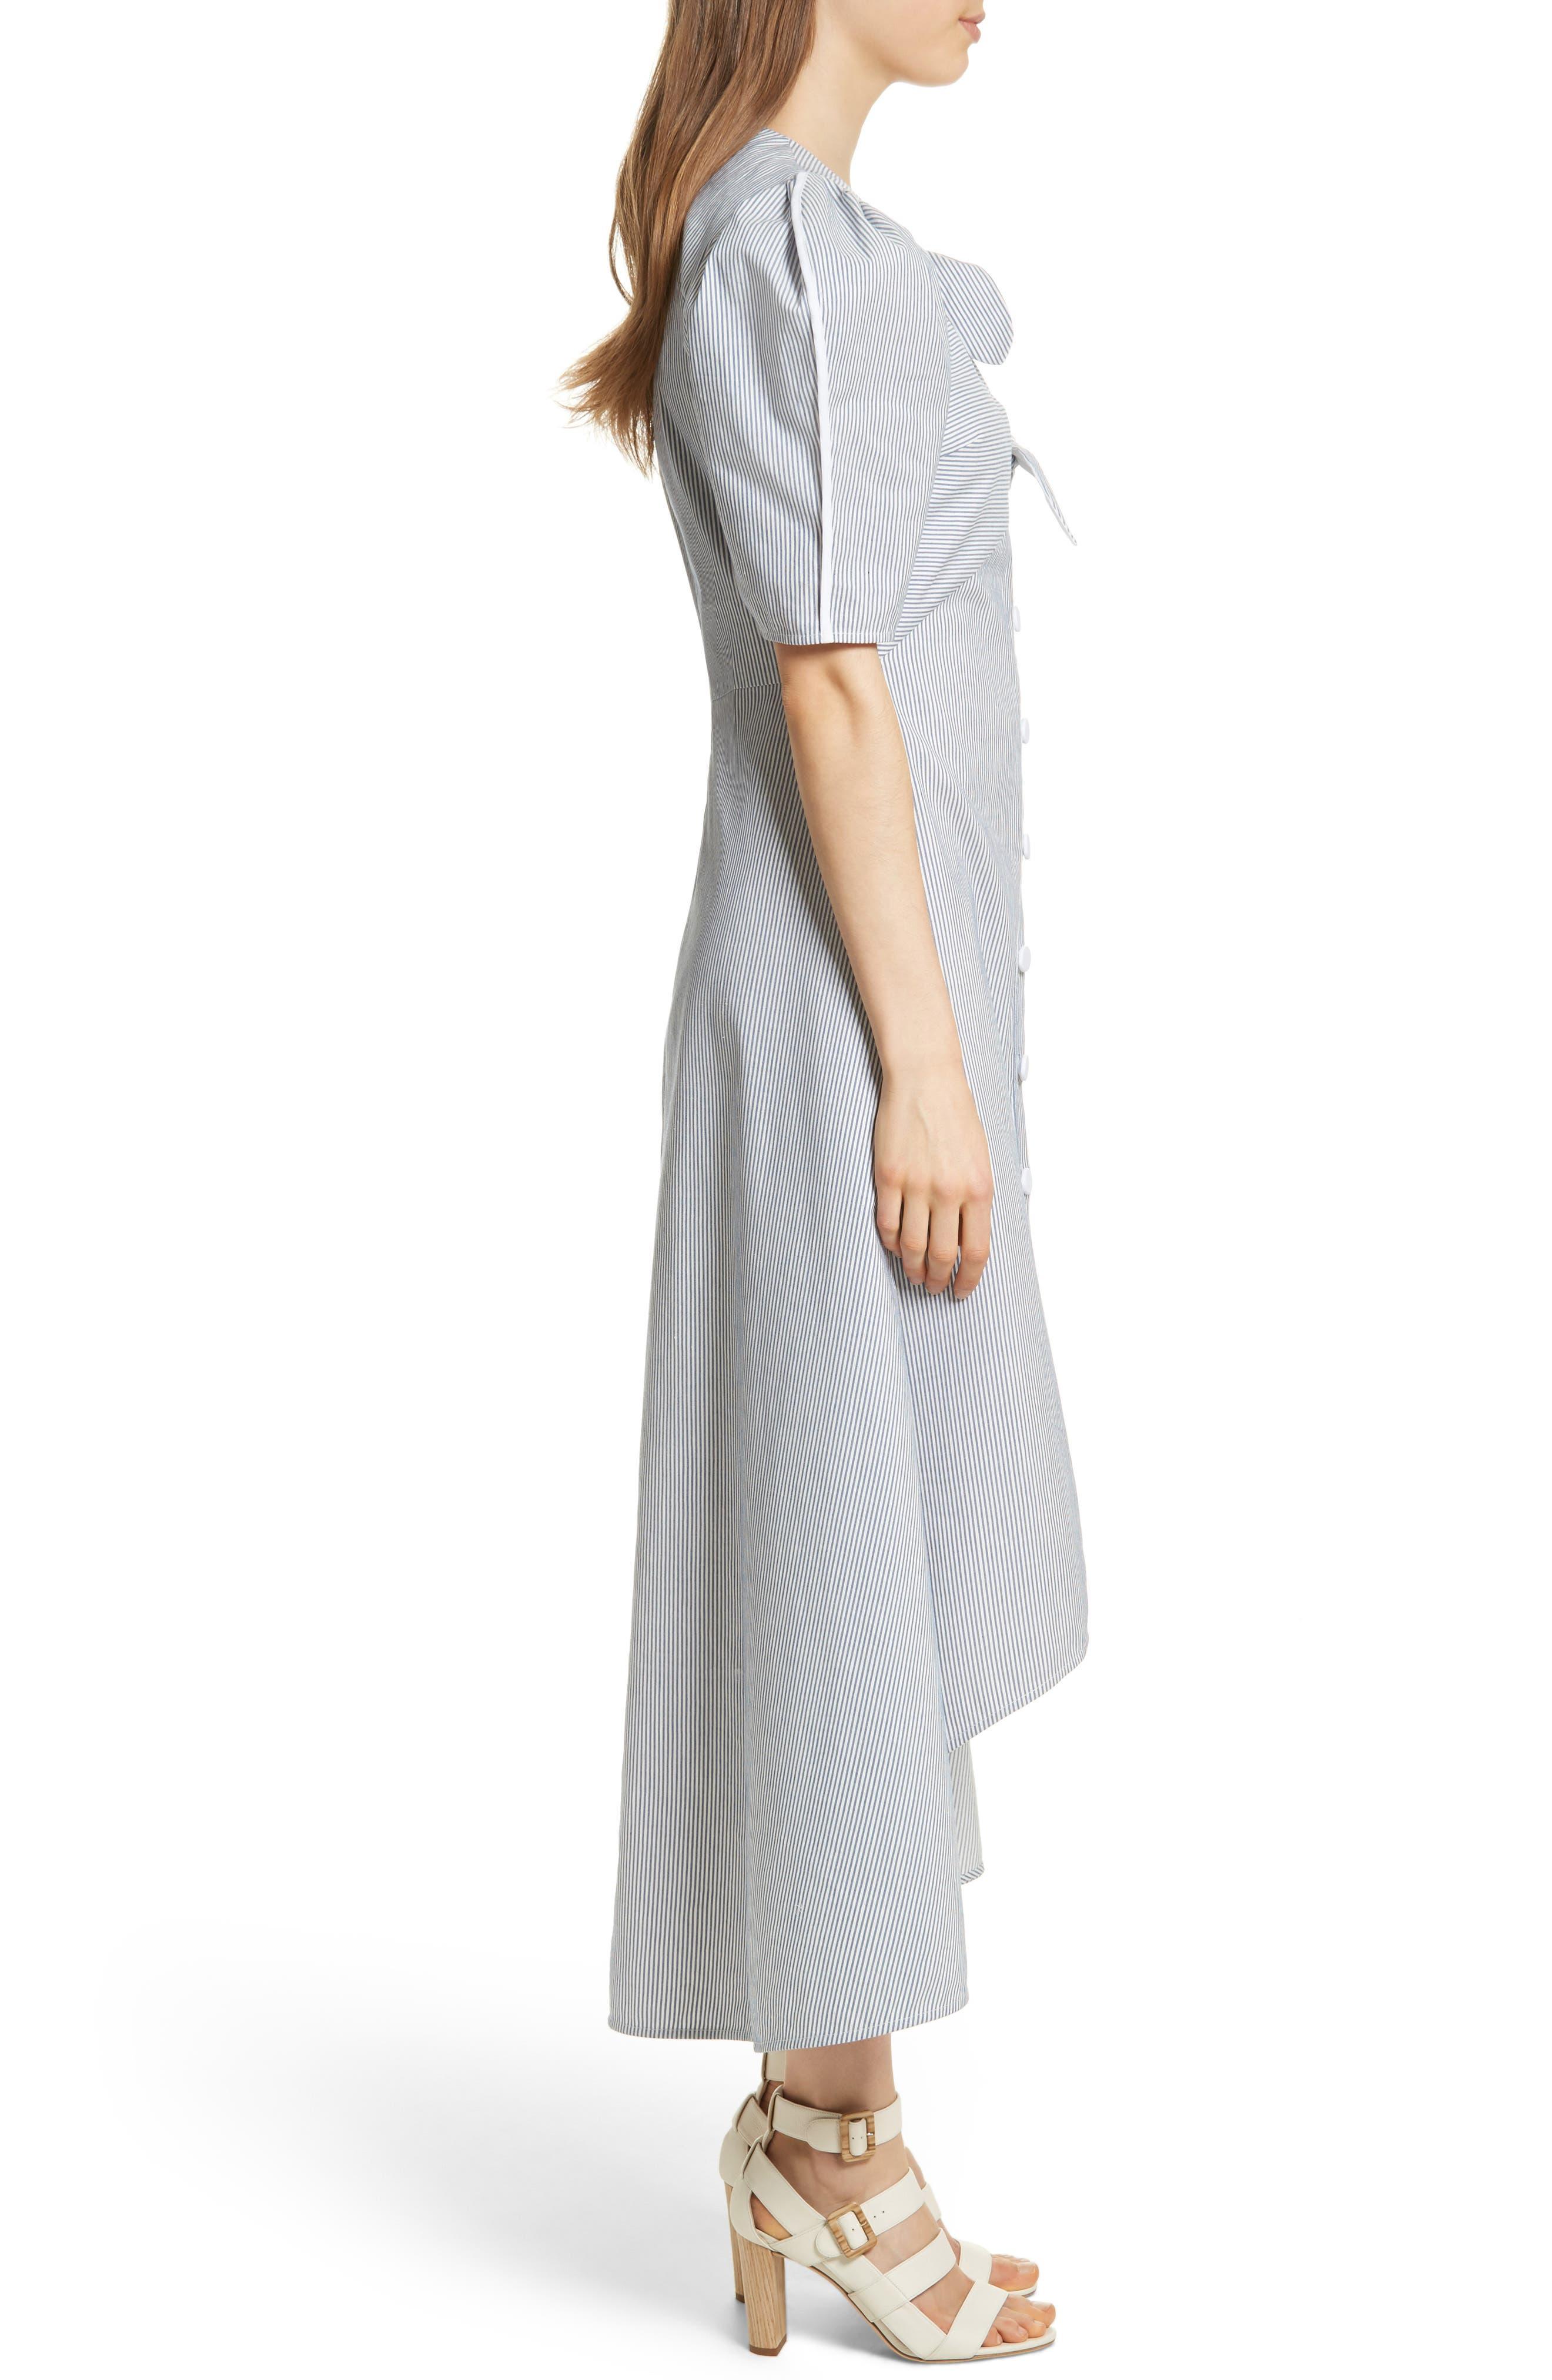 Prose & Poetry Camila Double Front Tie Midi Dress,                             Alternate thumbnail 3, color,                             Canvas Stripe